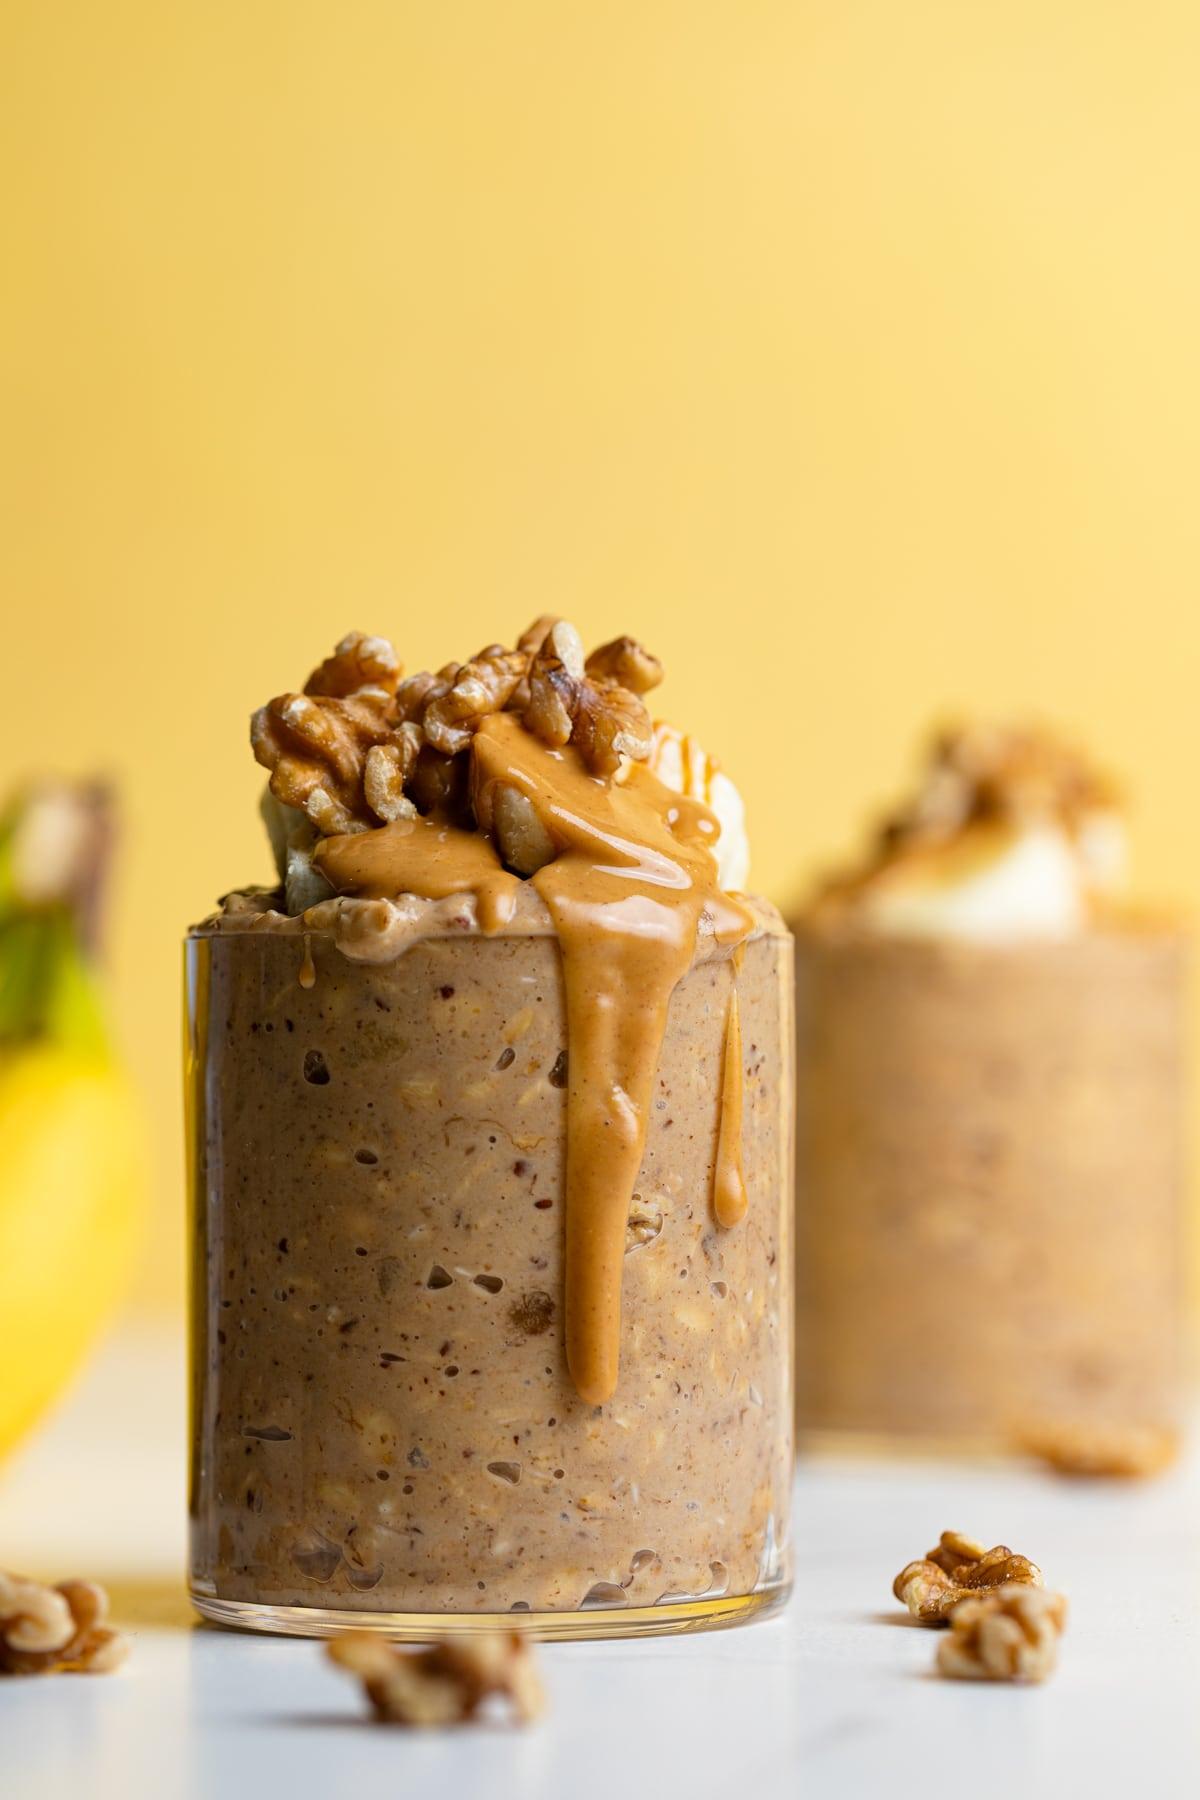 Banana Peanut Butter Overnight Oats